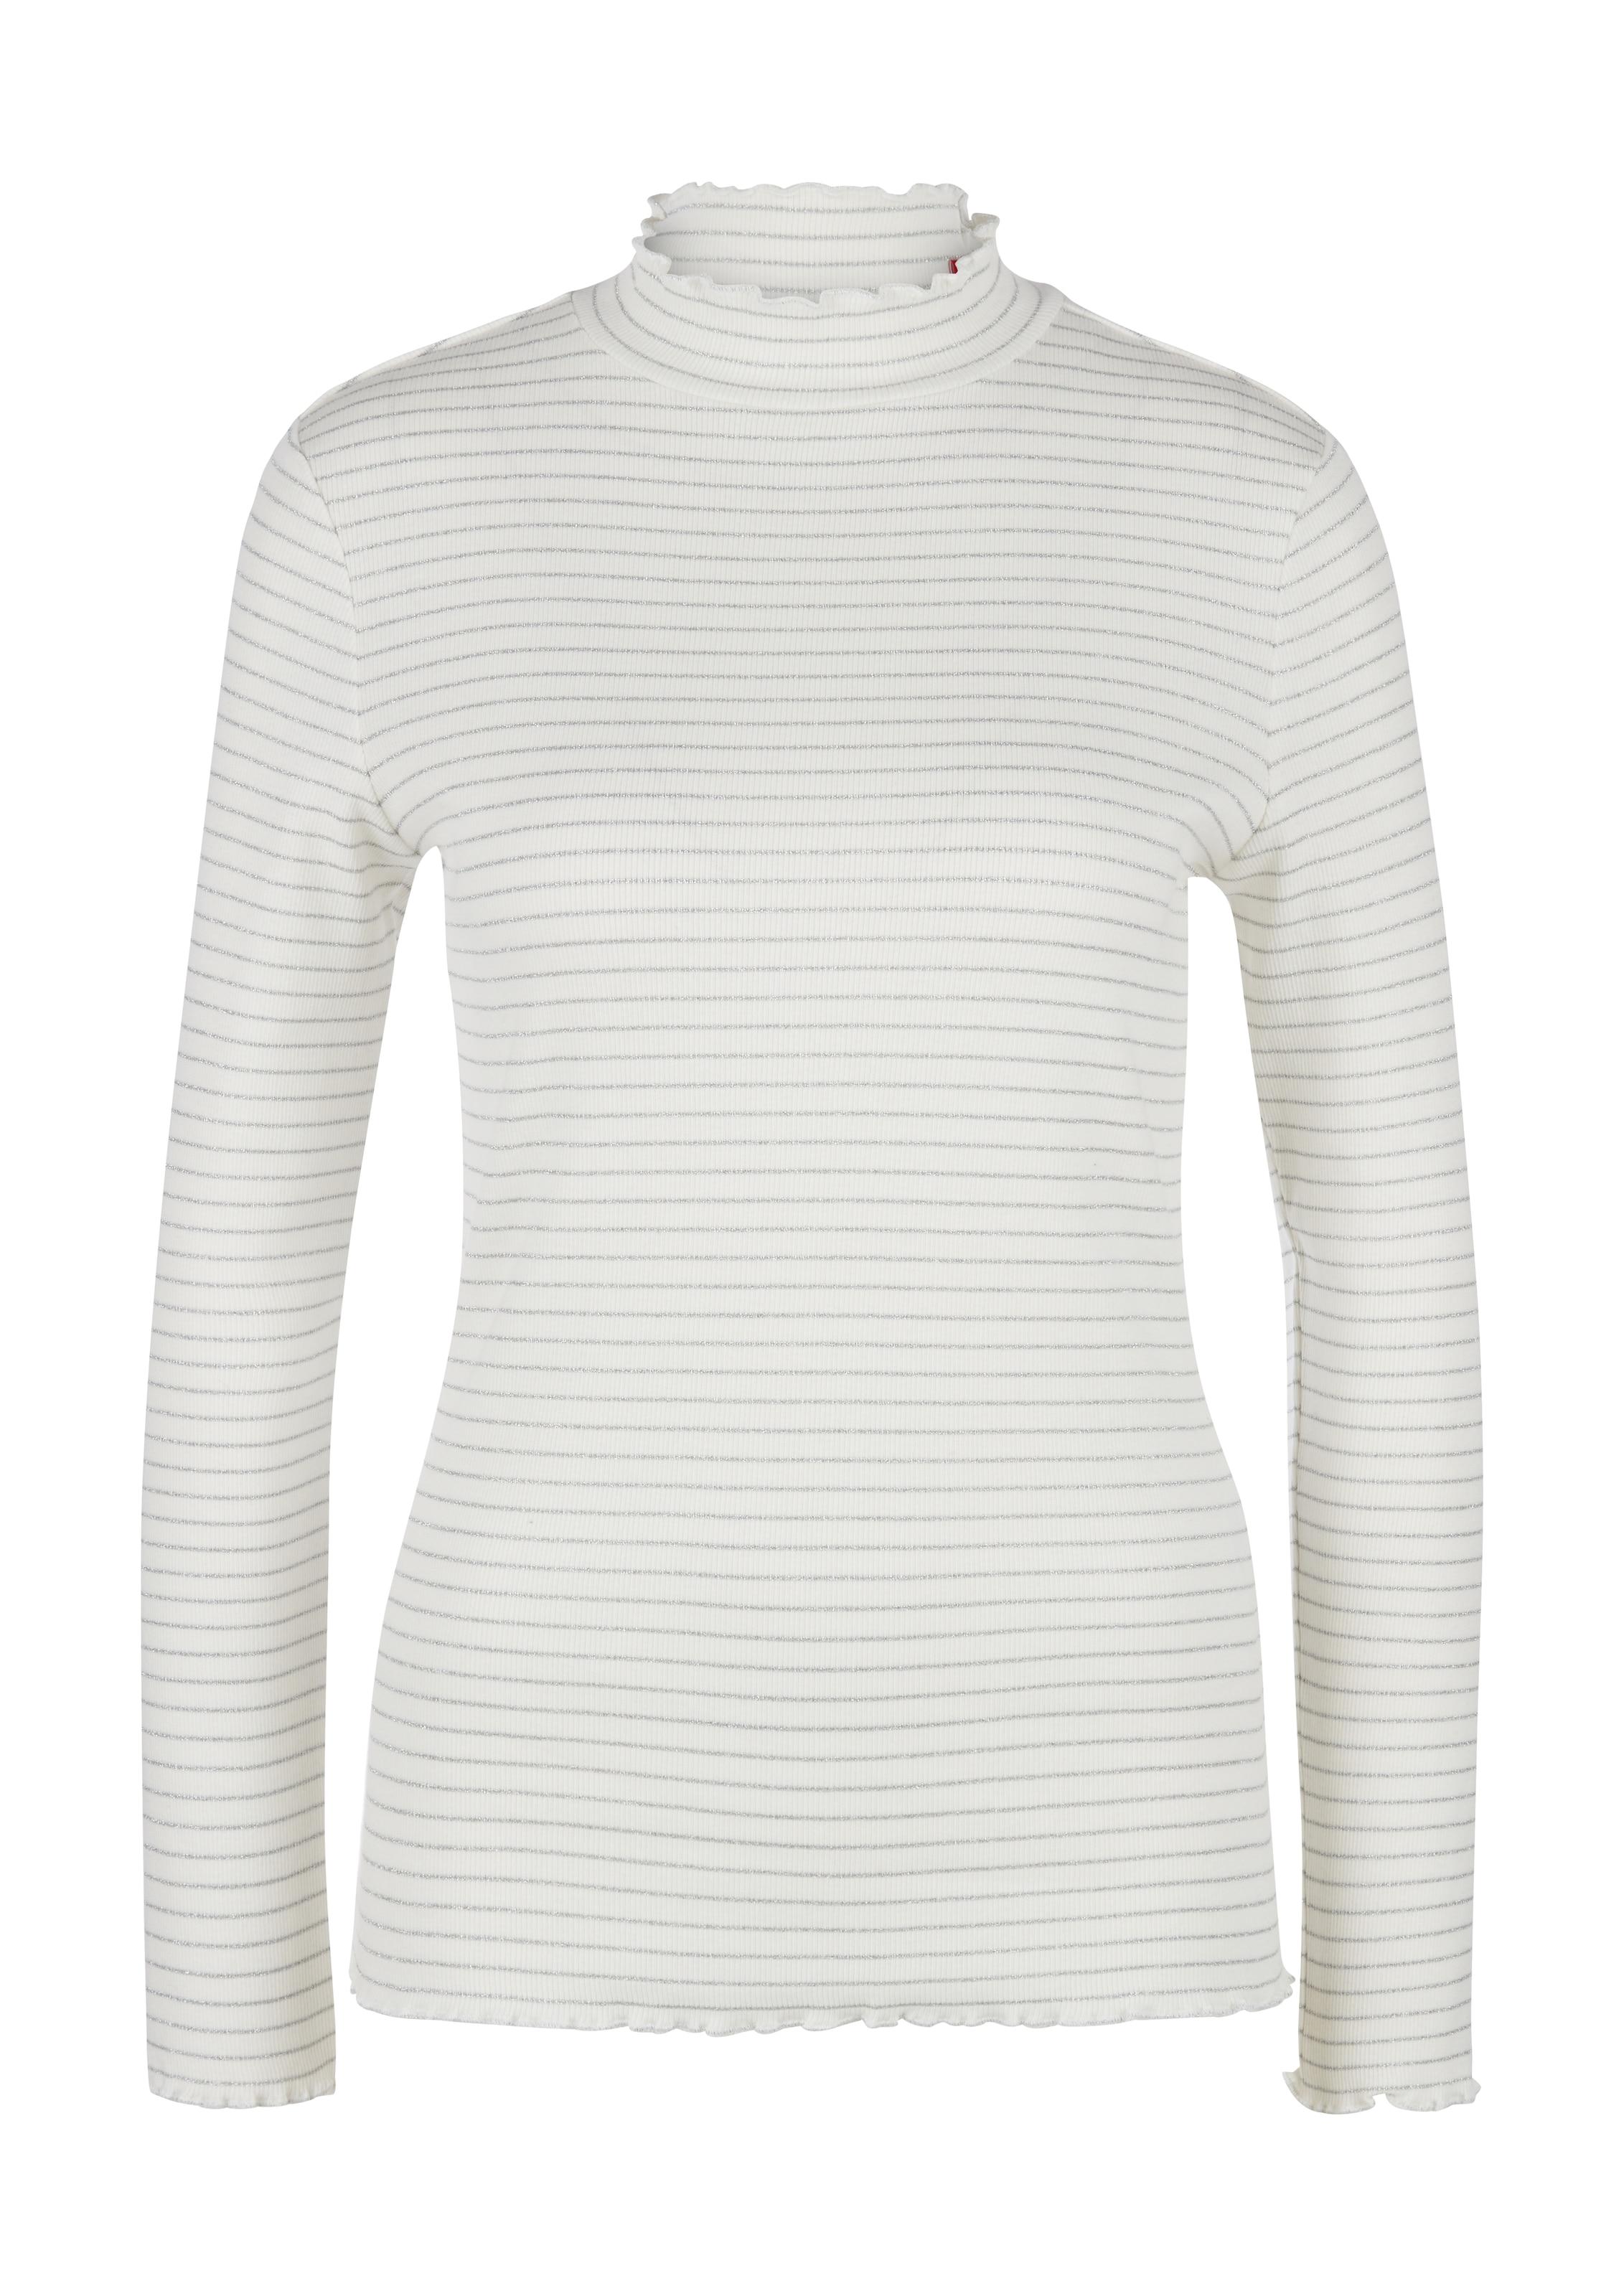 s.Oliver Shirt in silber / weiß